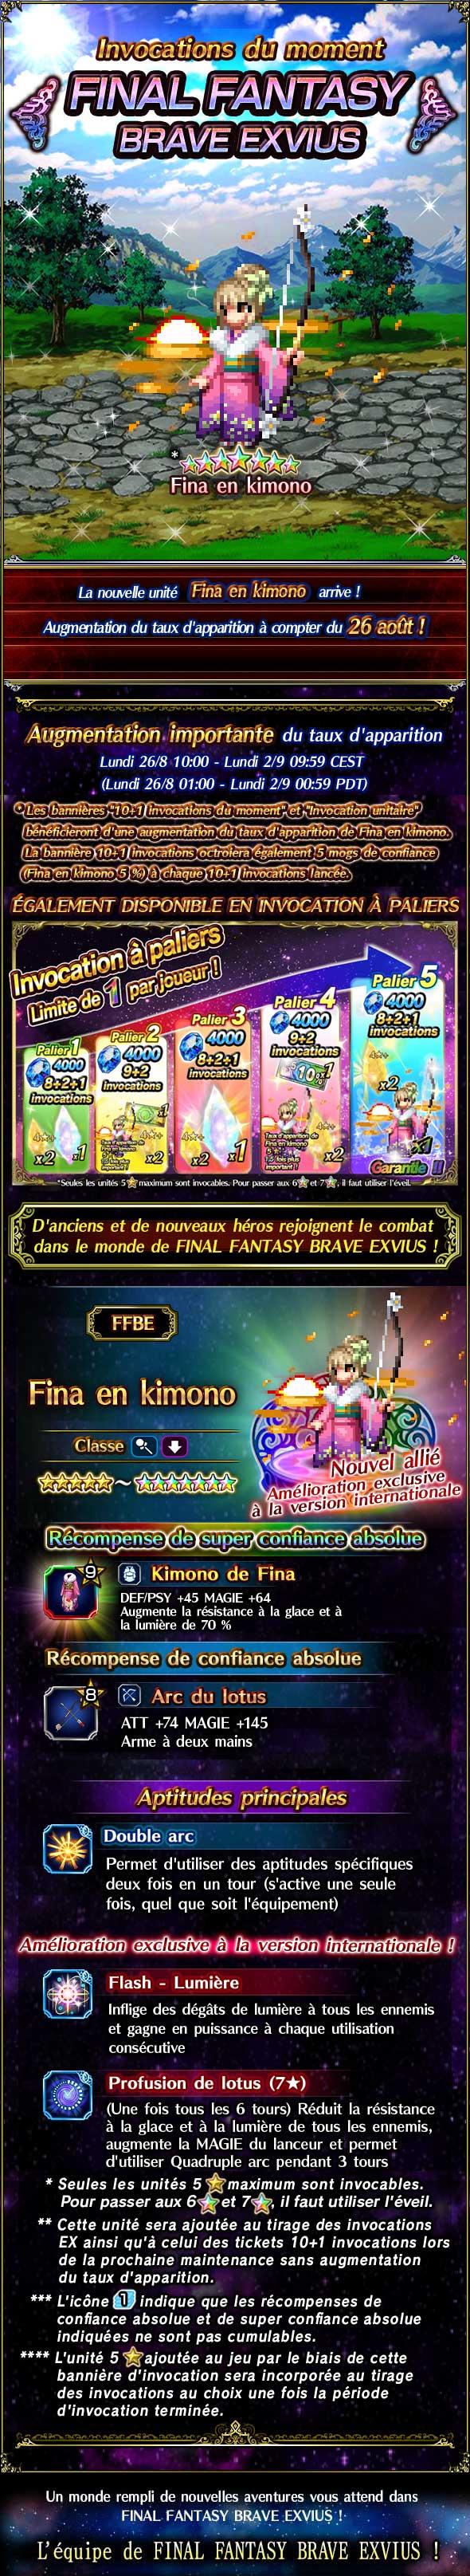 Invocations du moment - FFBE (KFina) - du 26/08 au 02/09/19 KimonoFinaFeatureSummon